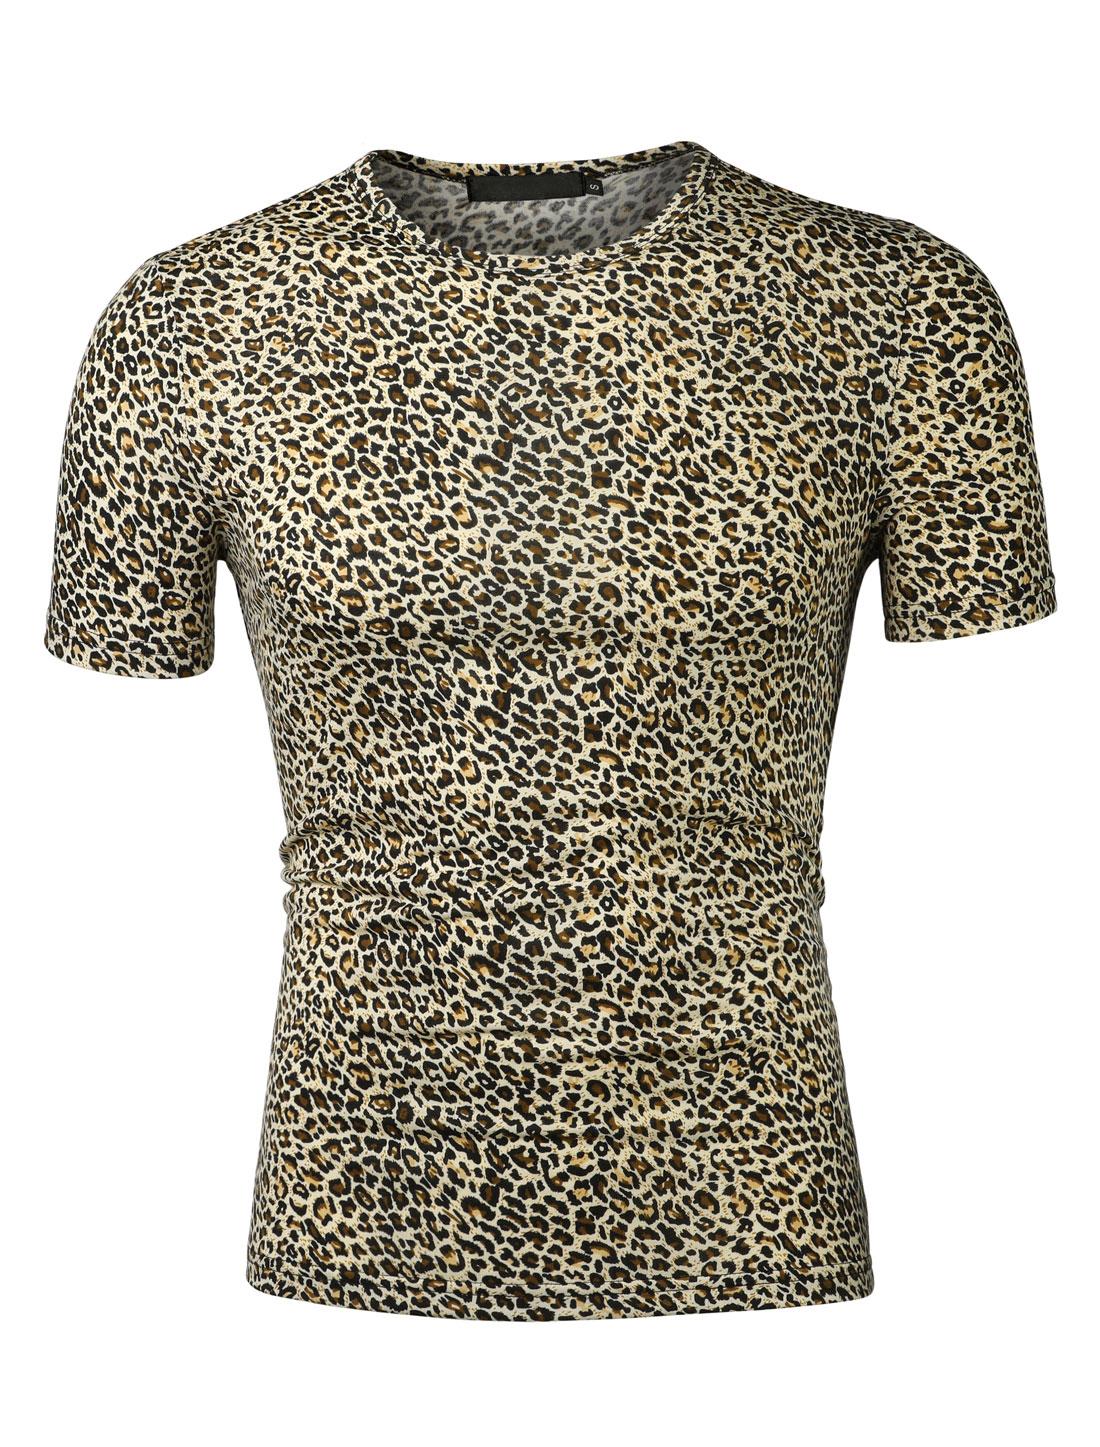 Men Leopard Prints Round Neck Cozy Fit Tee Shirt Beige Black S